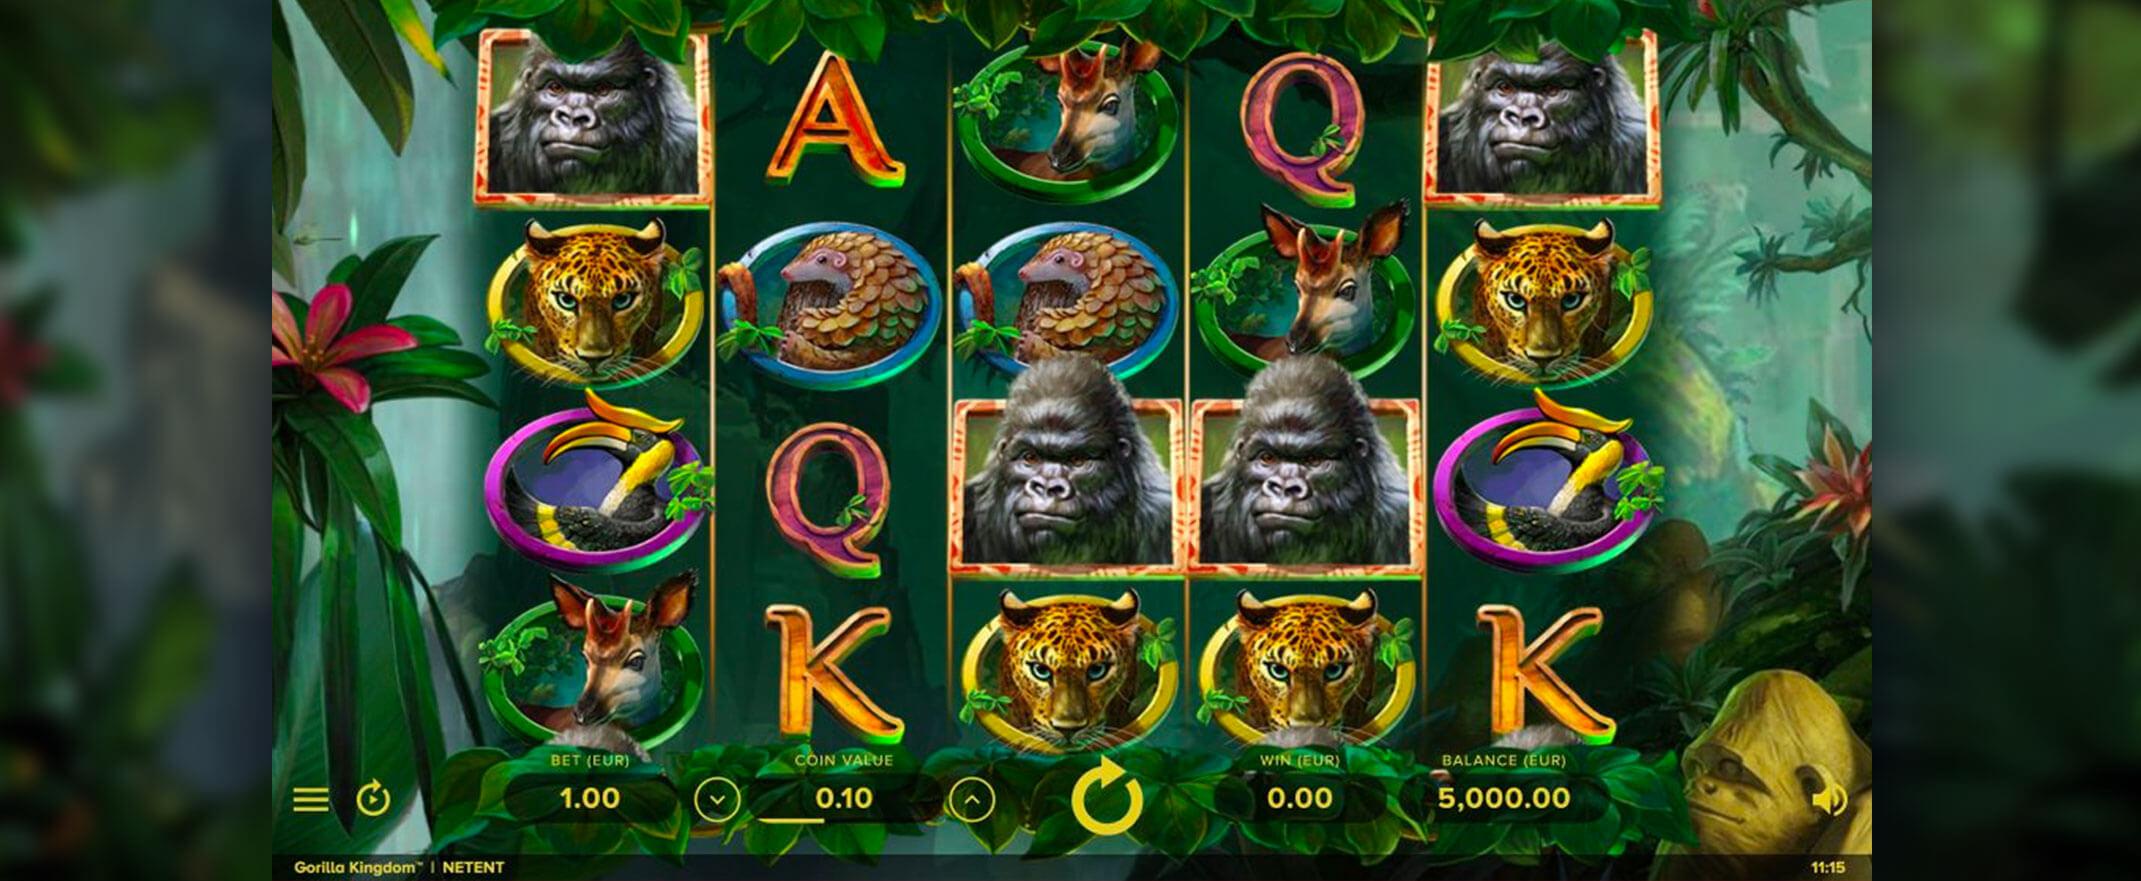 Gorilla-Kingdom